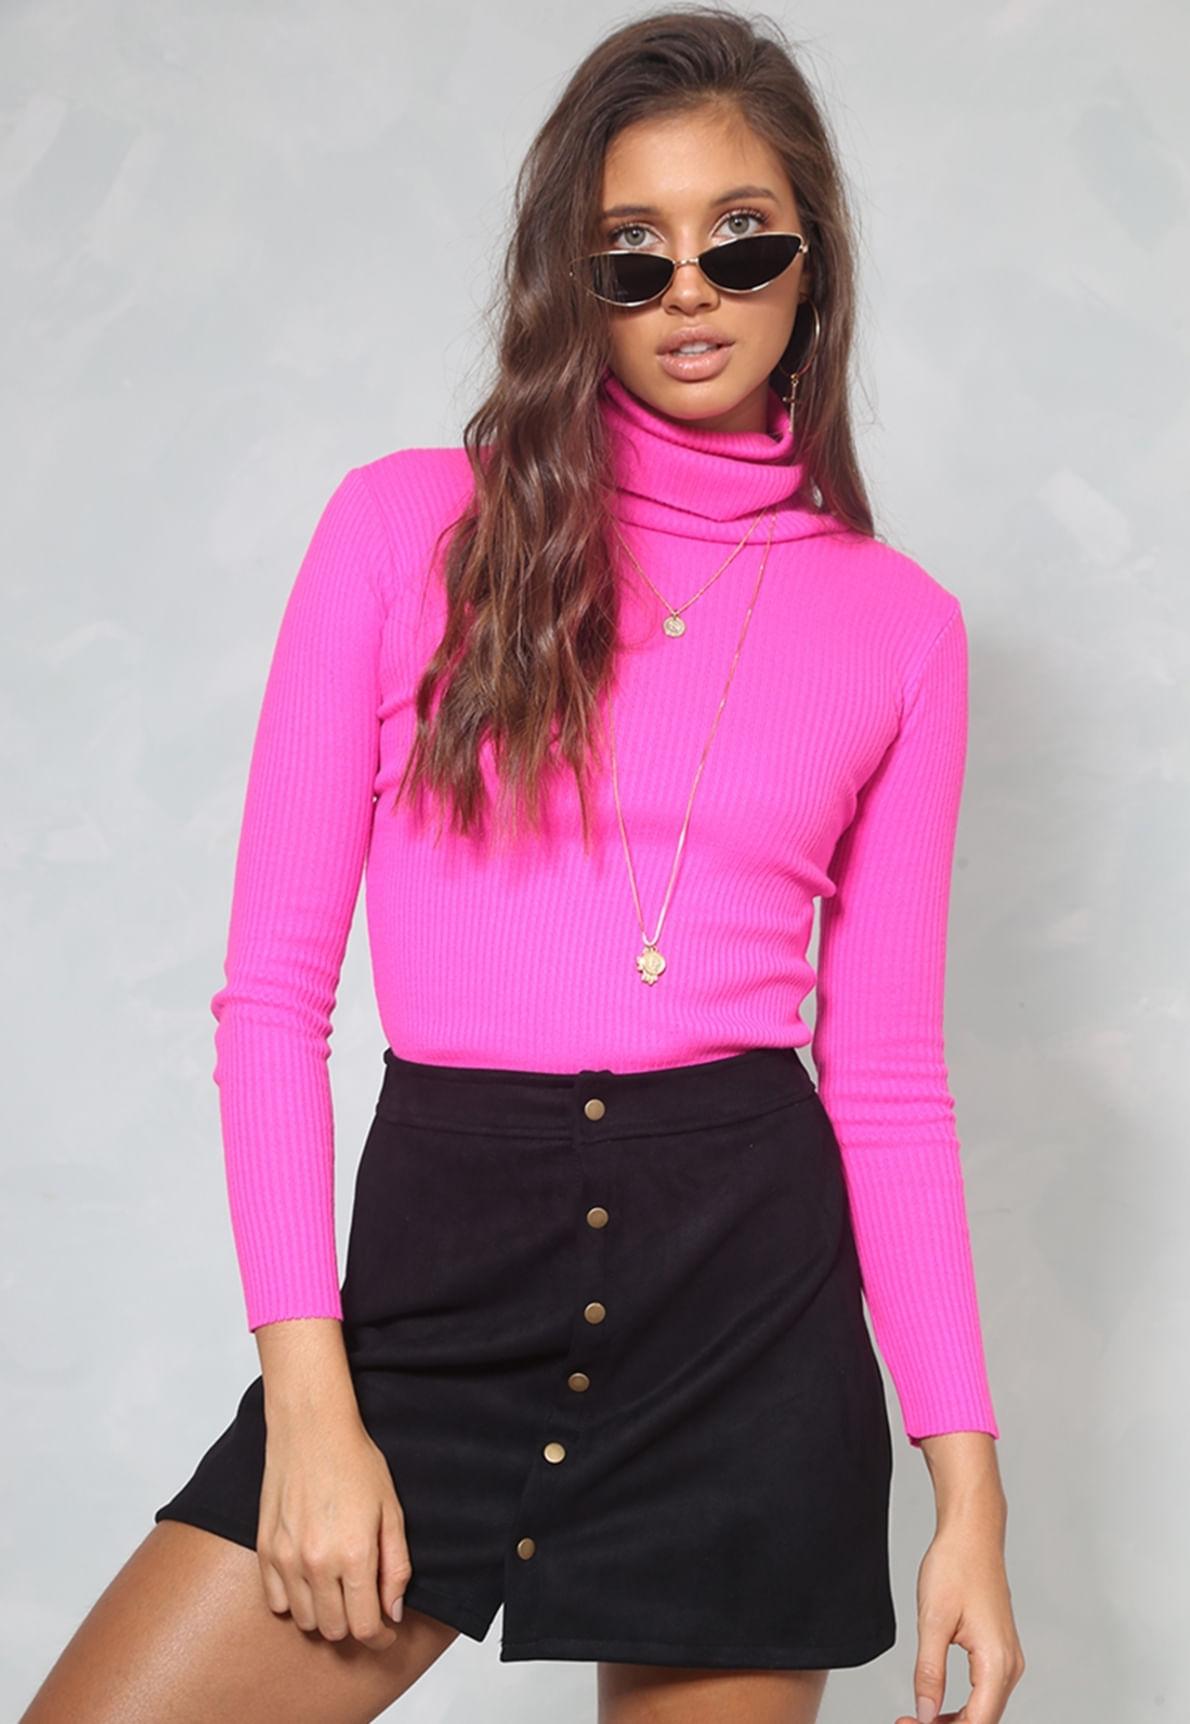 25978-blusa-de-trico-rosa-paola-mundo-lolita-01